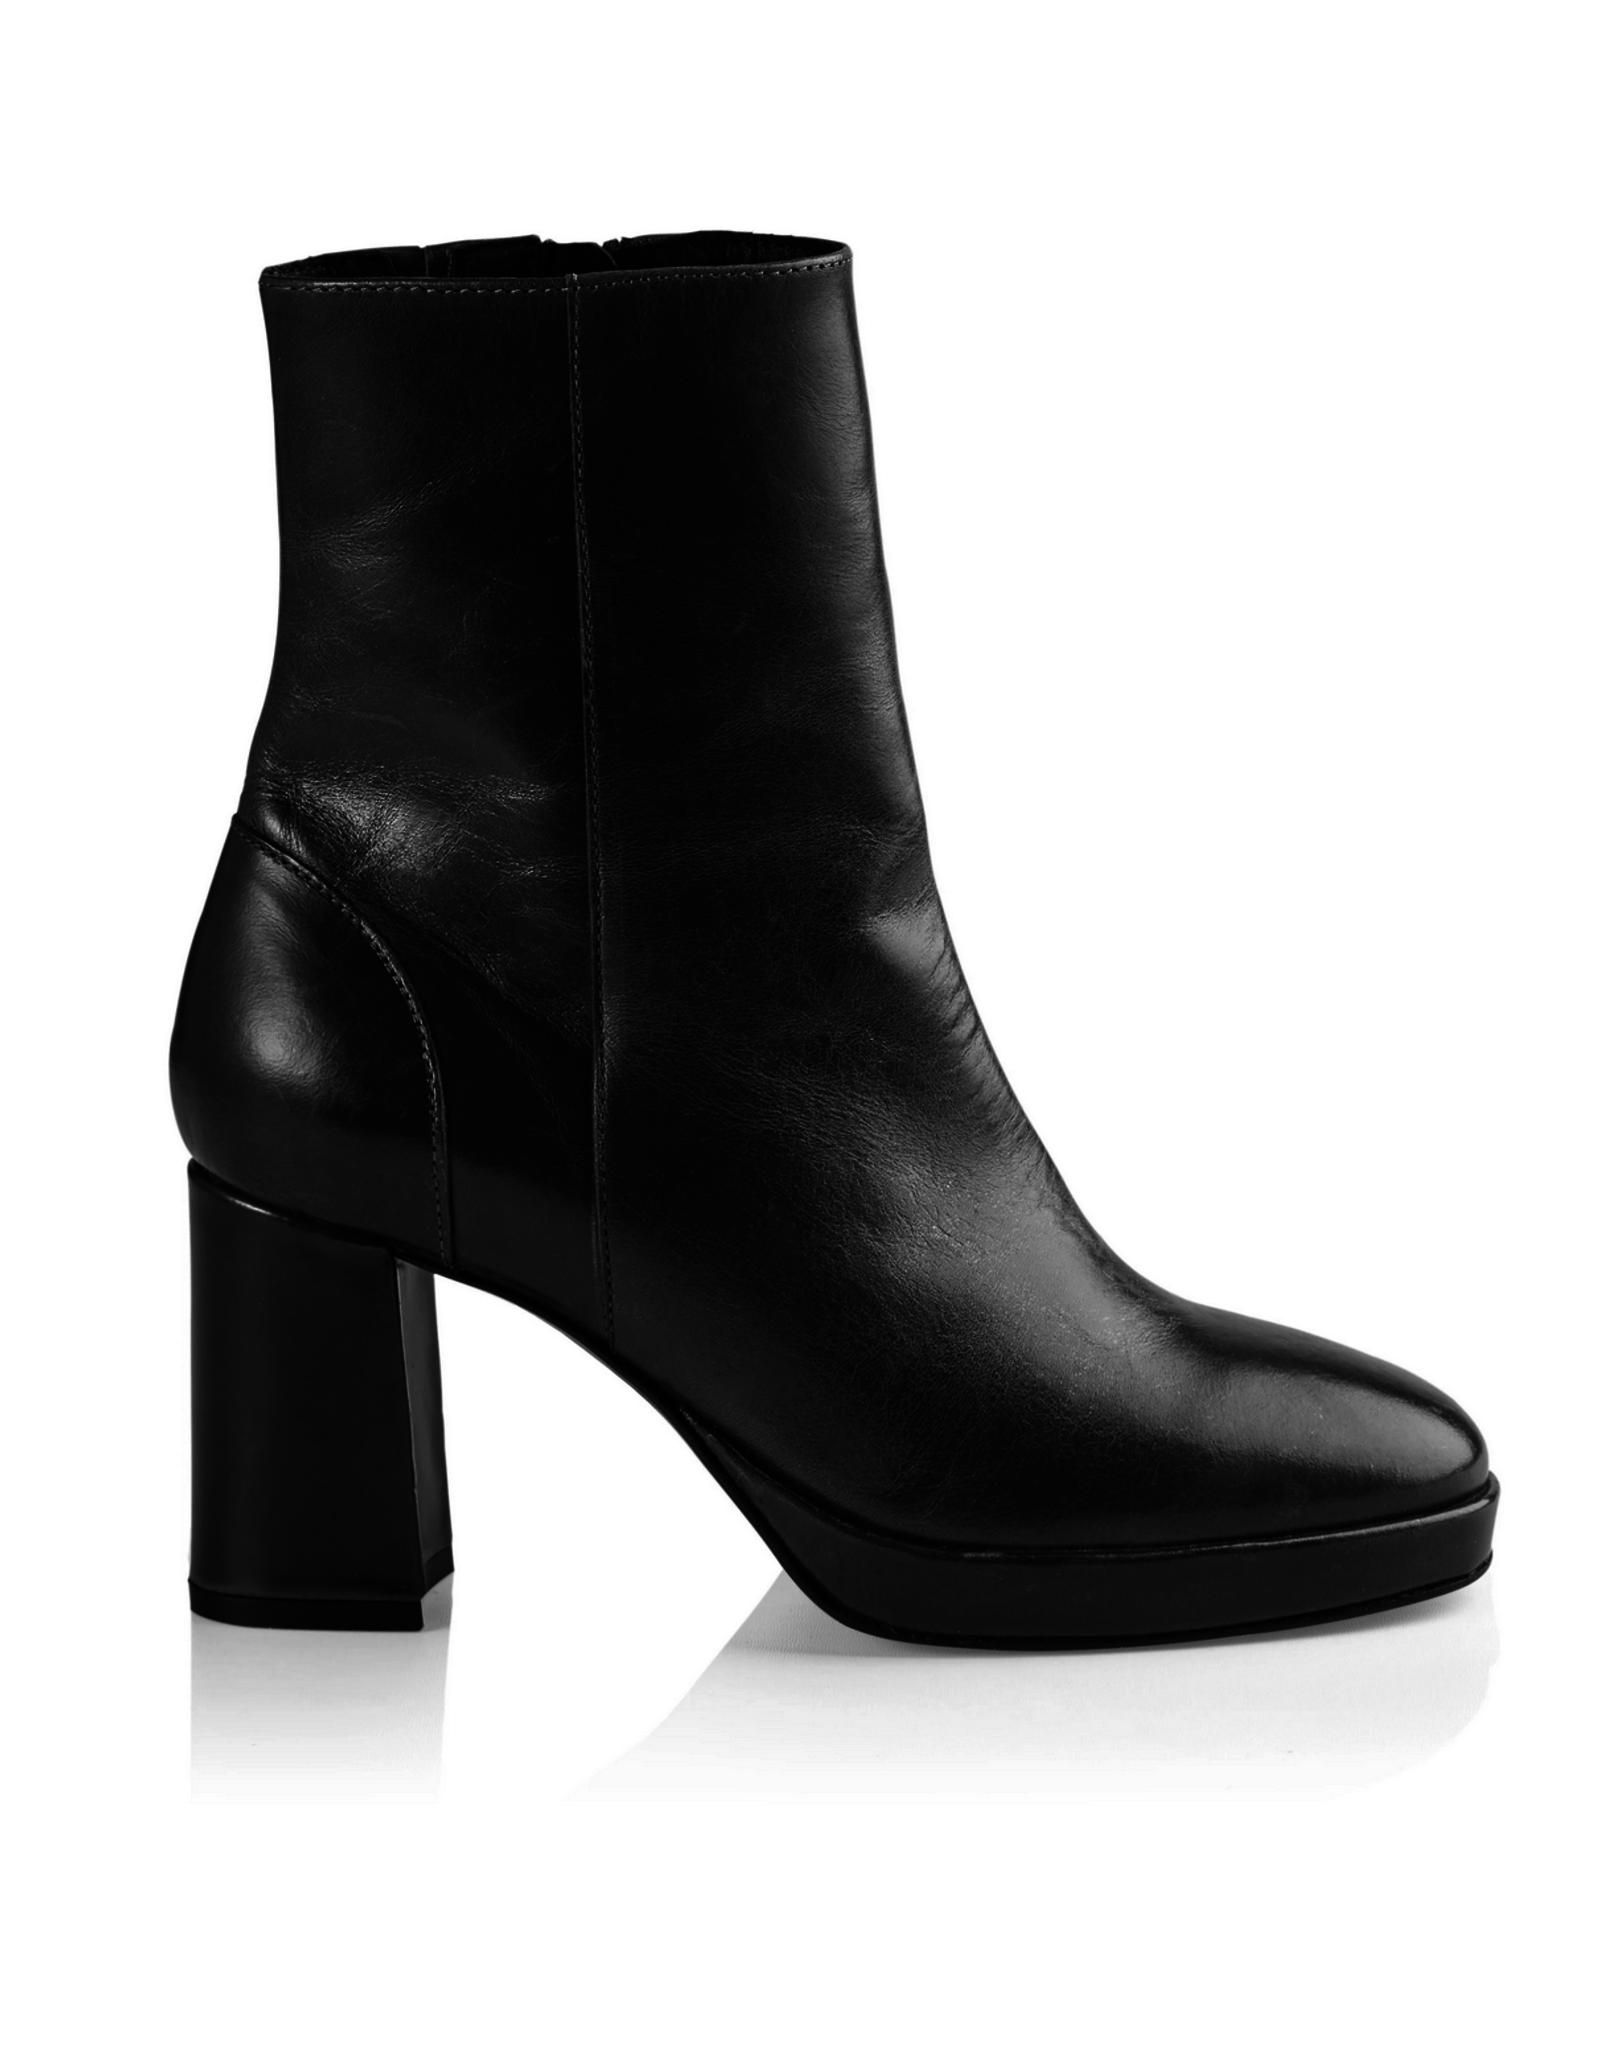 Asta leather black